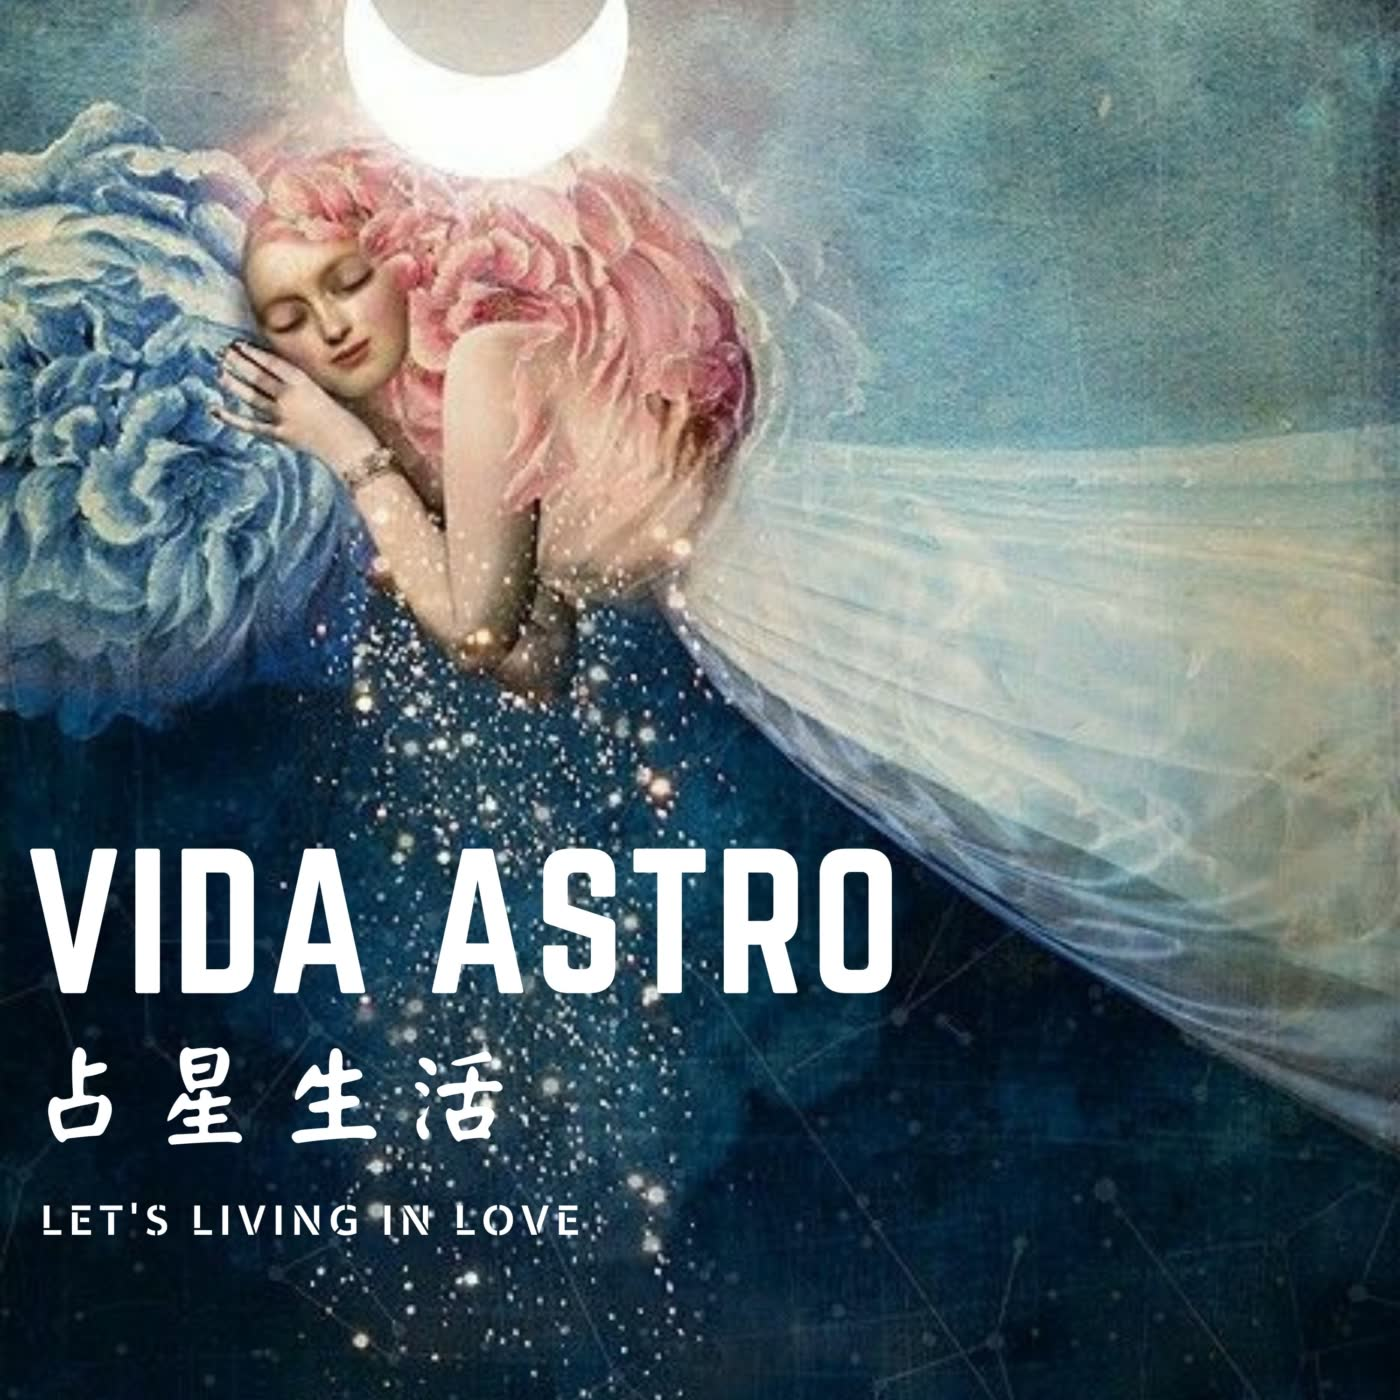 Vida Astro 占星生活